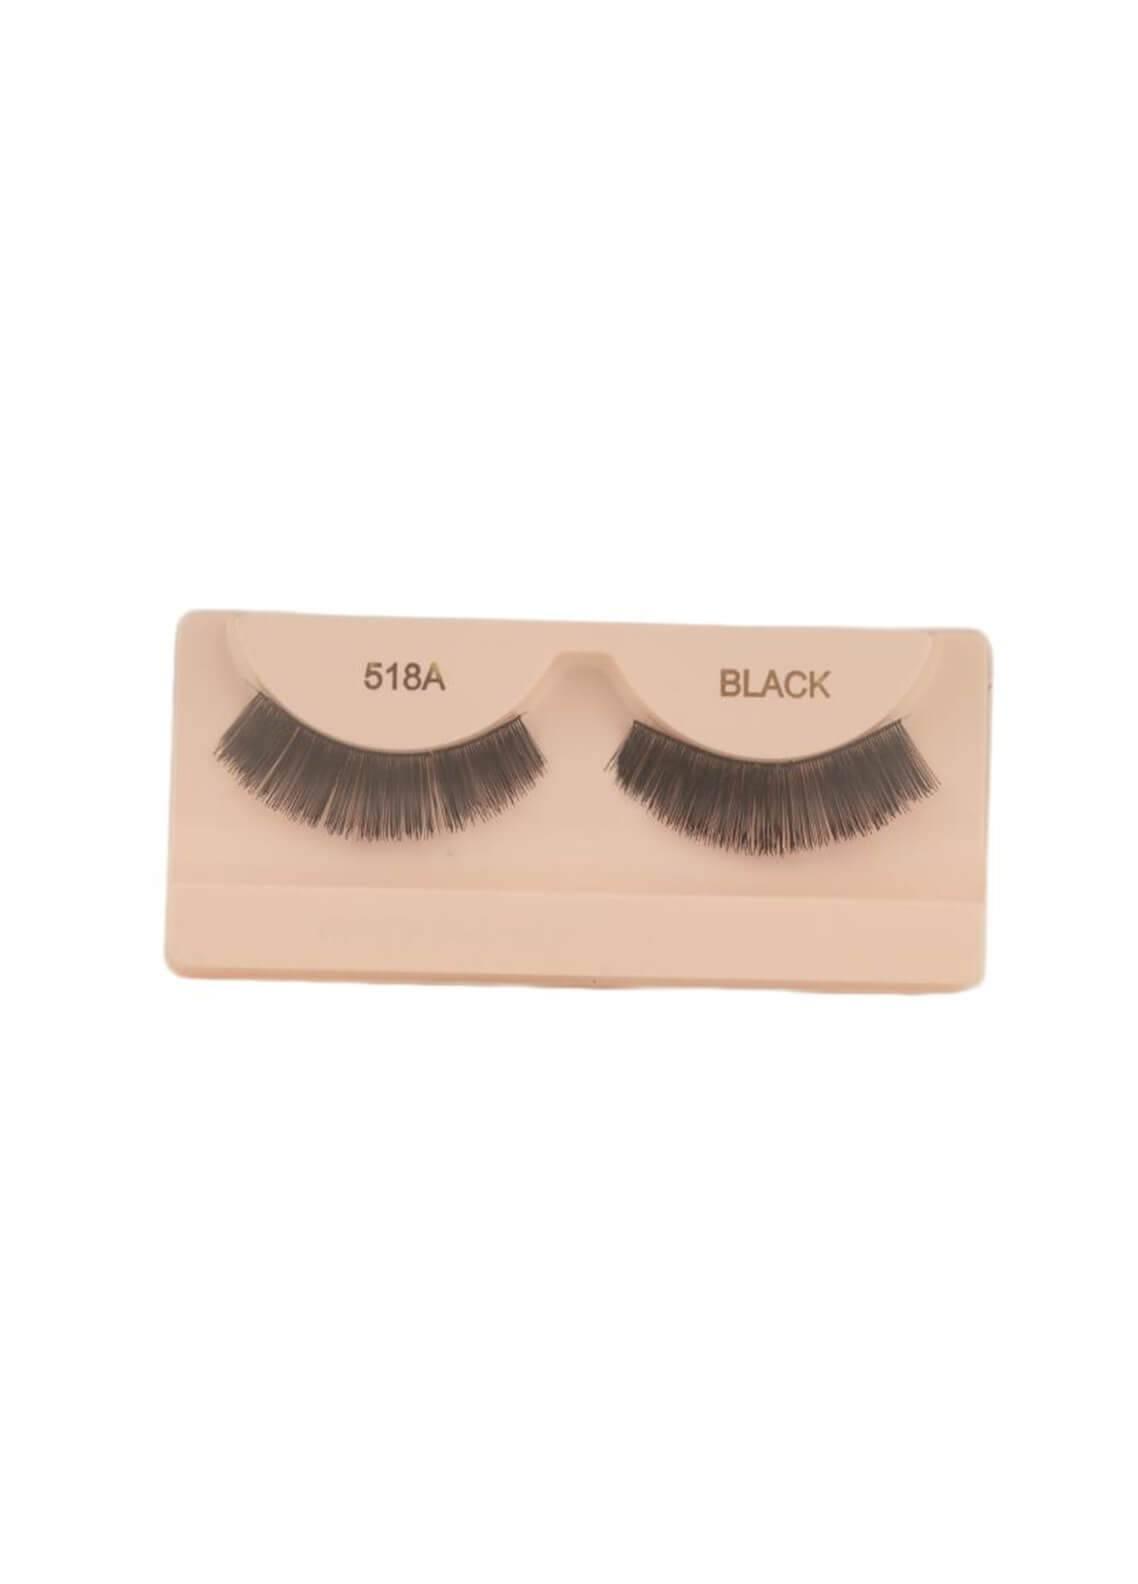 Sophia Asley EyeLashes Sweet Dolly - Black Natural Noir Natural